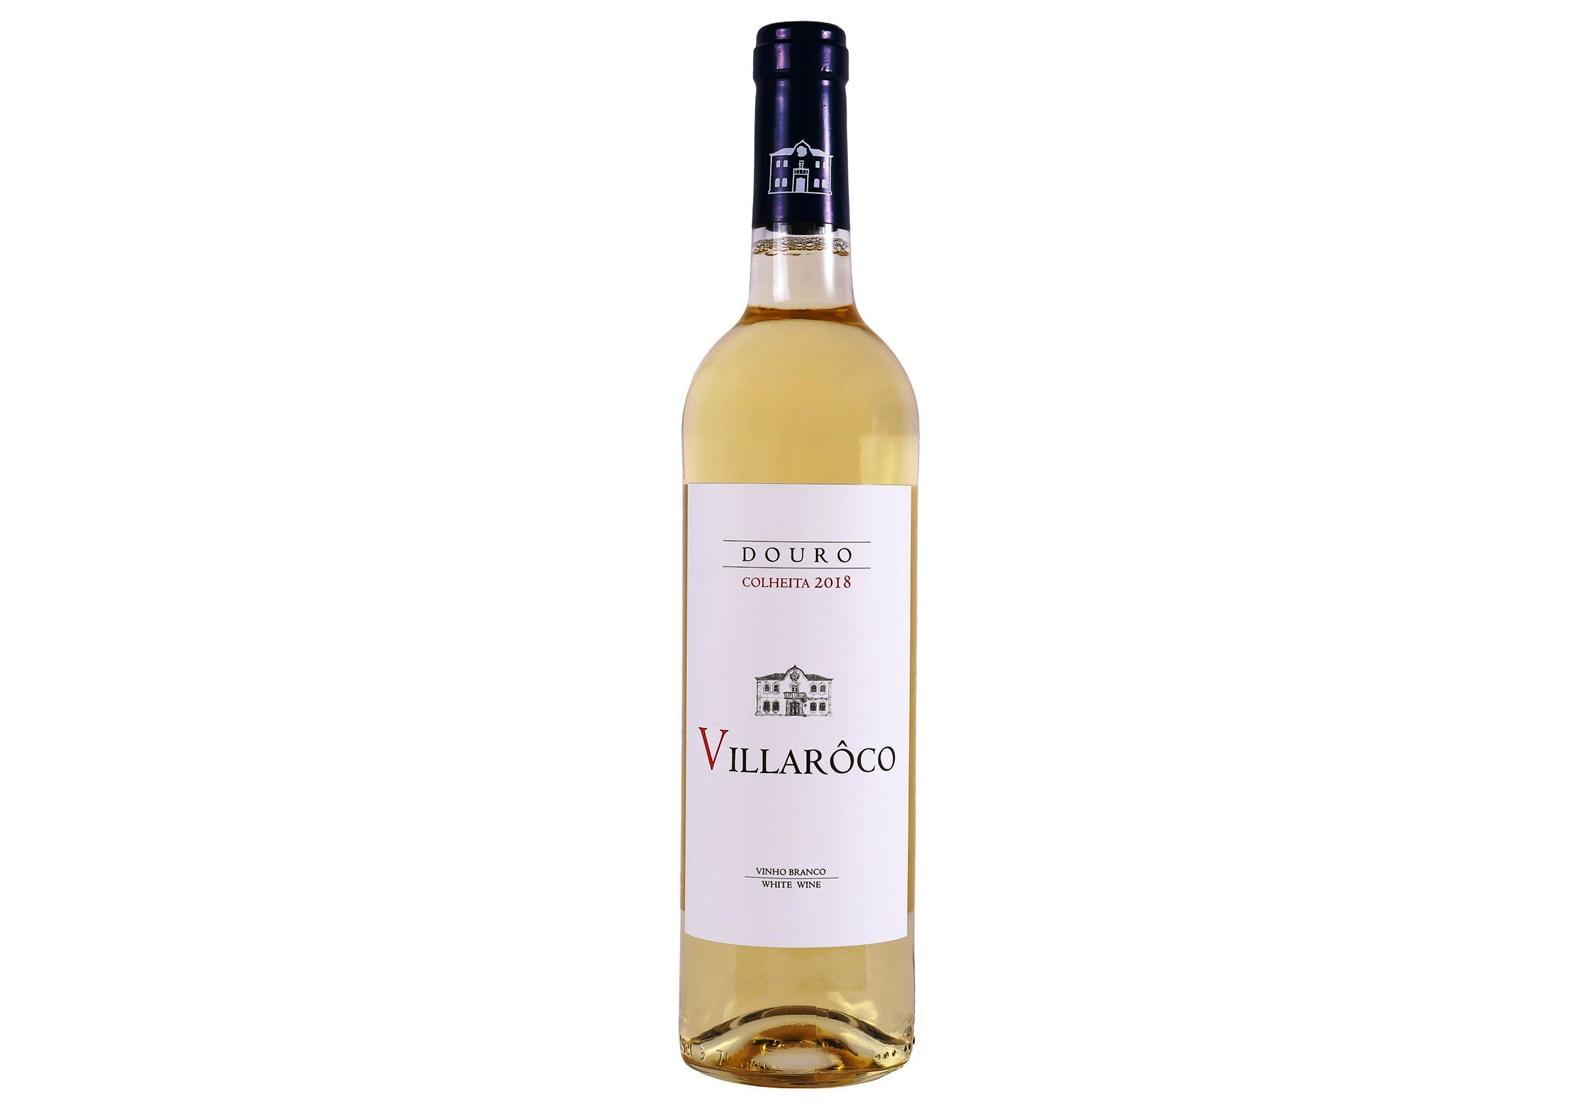 Villaroco blanc - Quinta Villaroco - Vindo du Douro Portugal